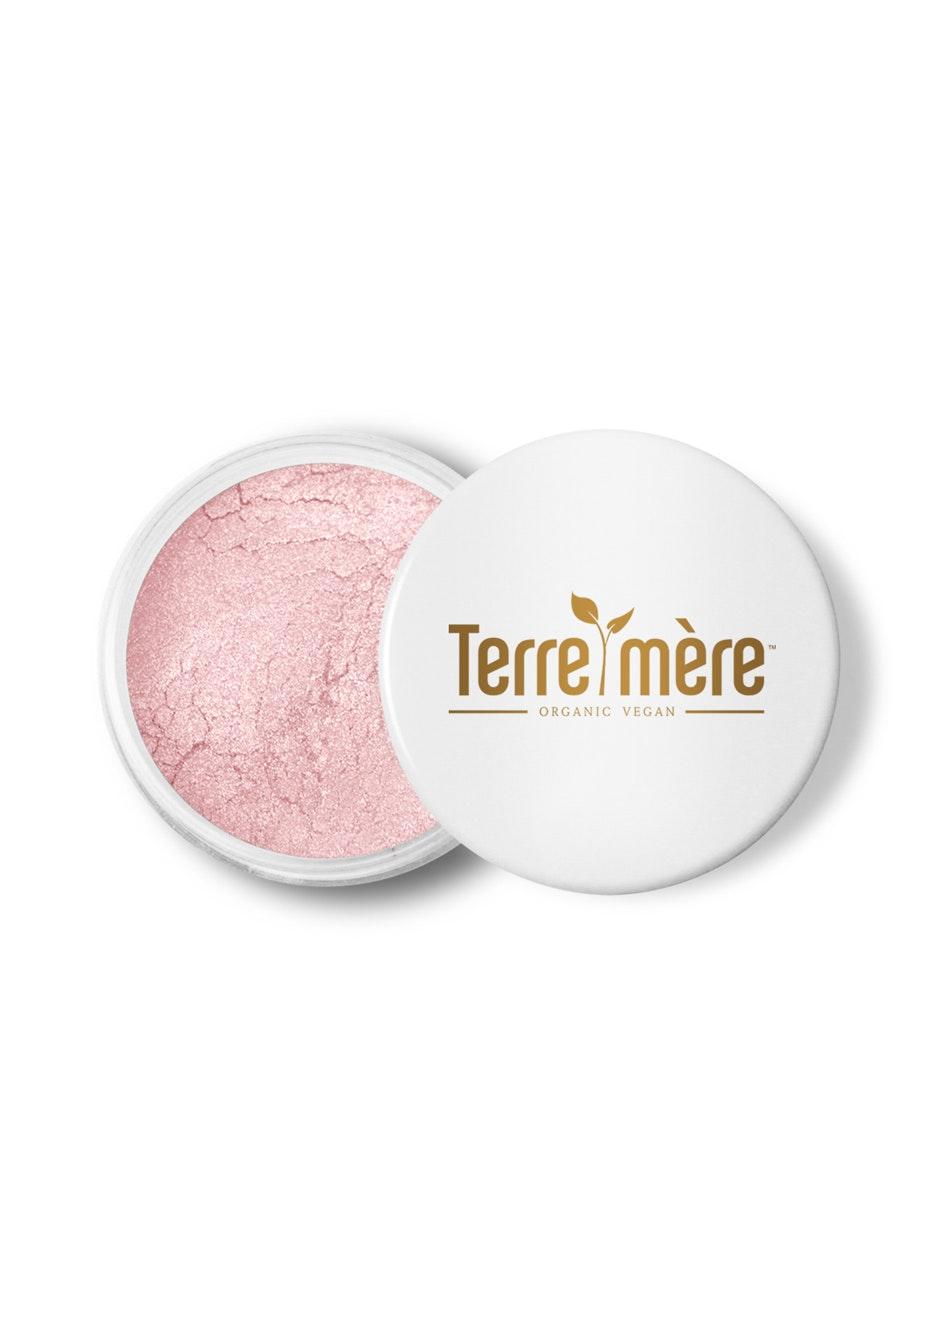 Terre Mere - Mineral Bronzer - Morganite